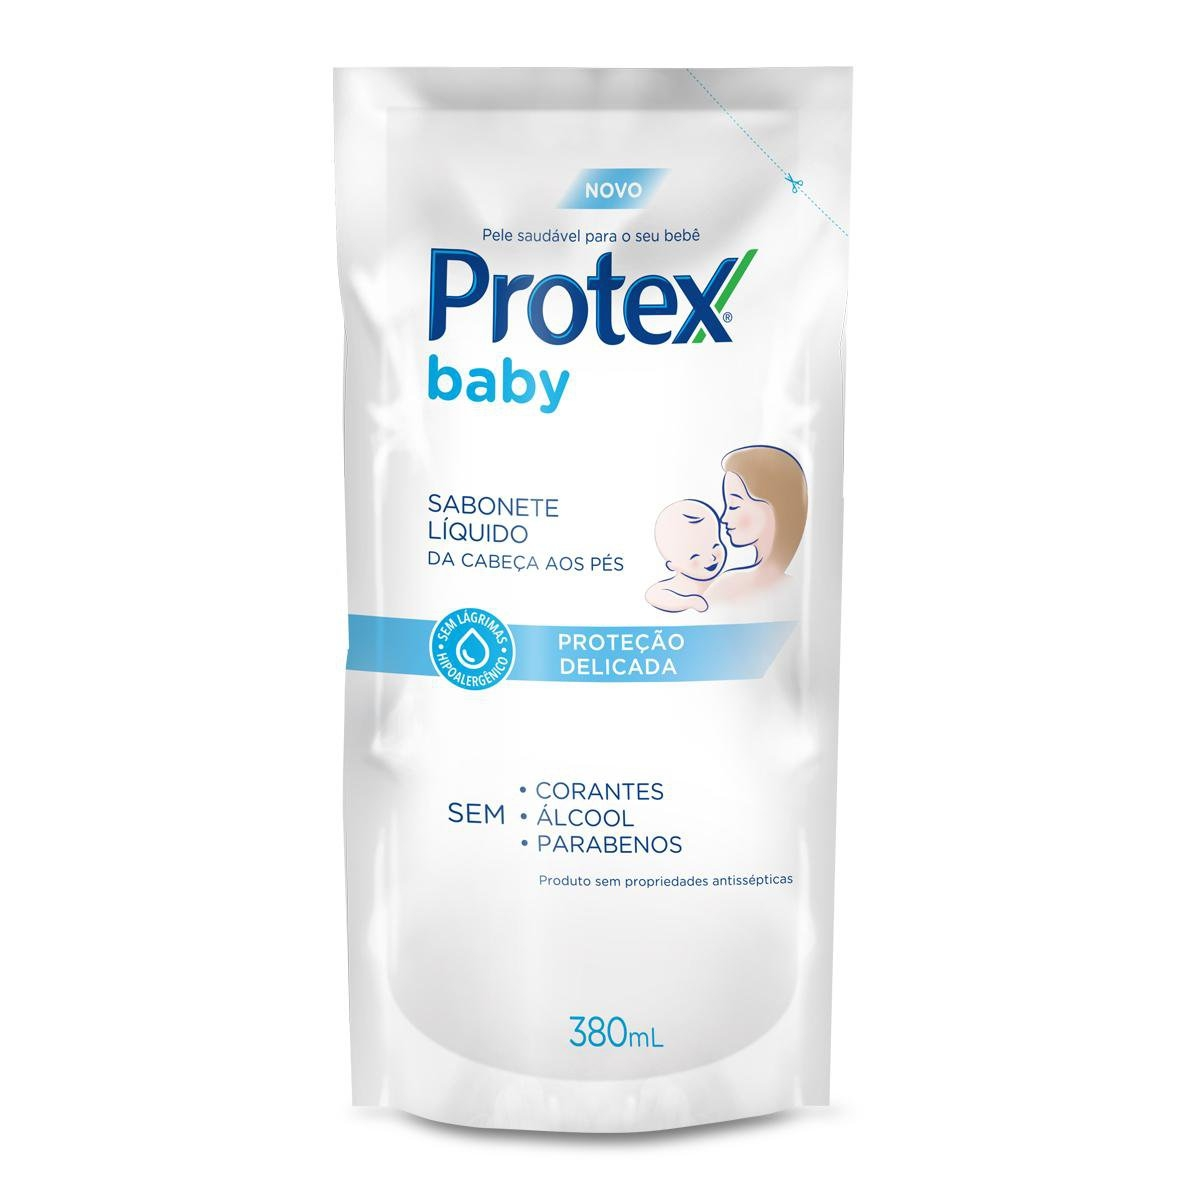 Refil Sabonete Líquido Protex Baby Cabeça aos Pés 380ml